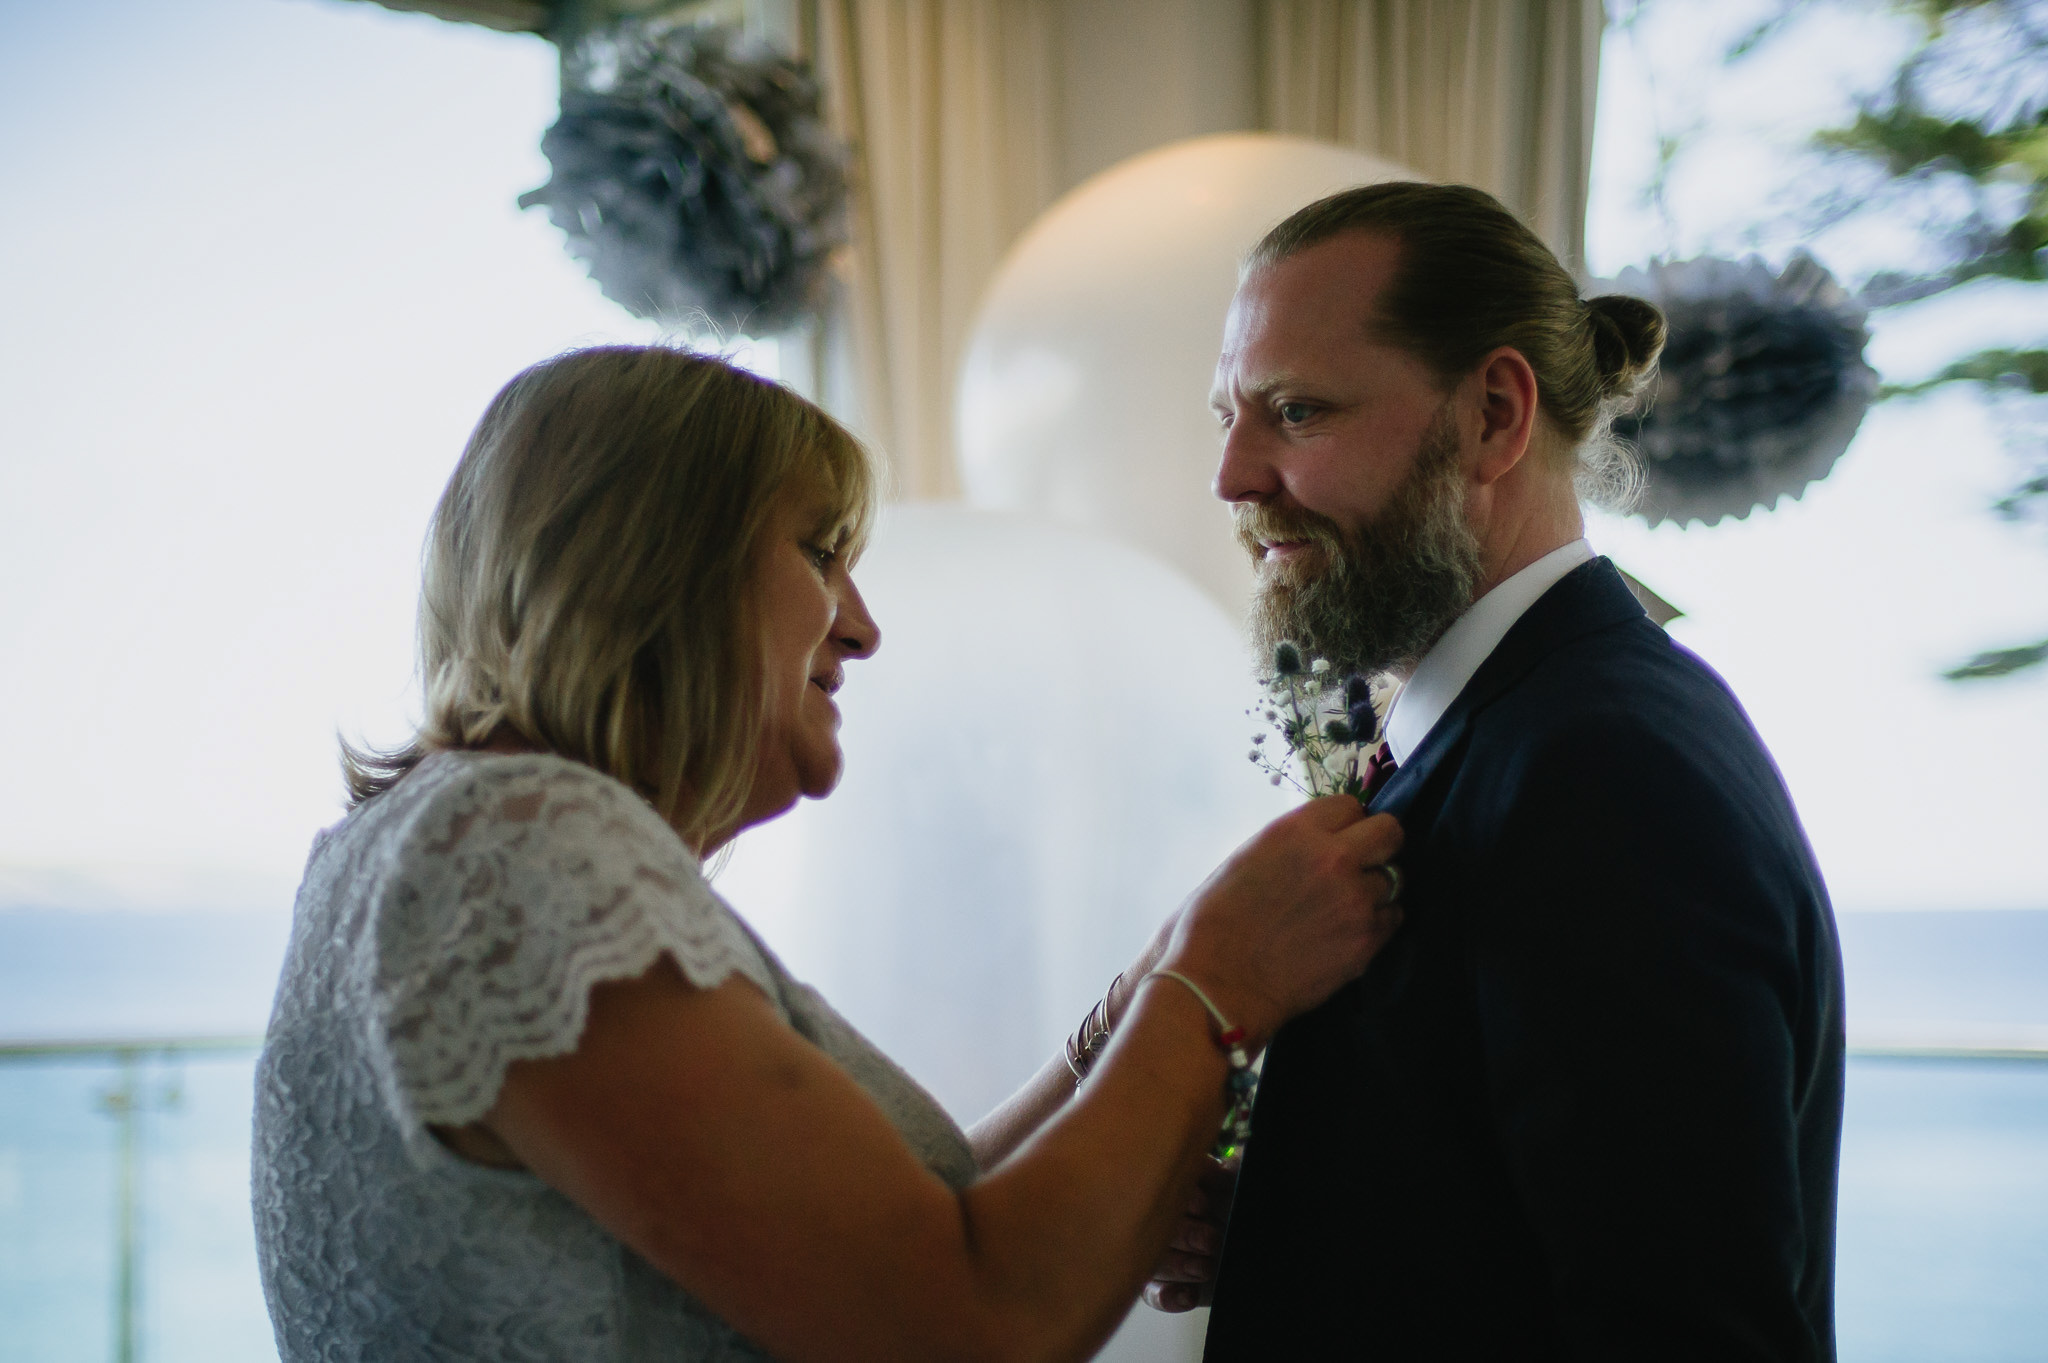 Cliff House Hotel Wedding Photographer Ireland-46.jpg